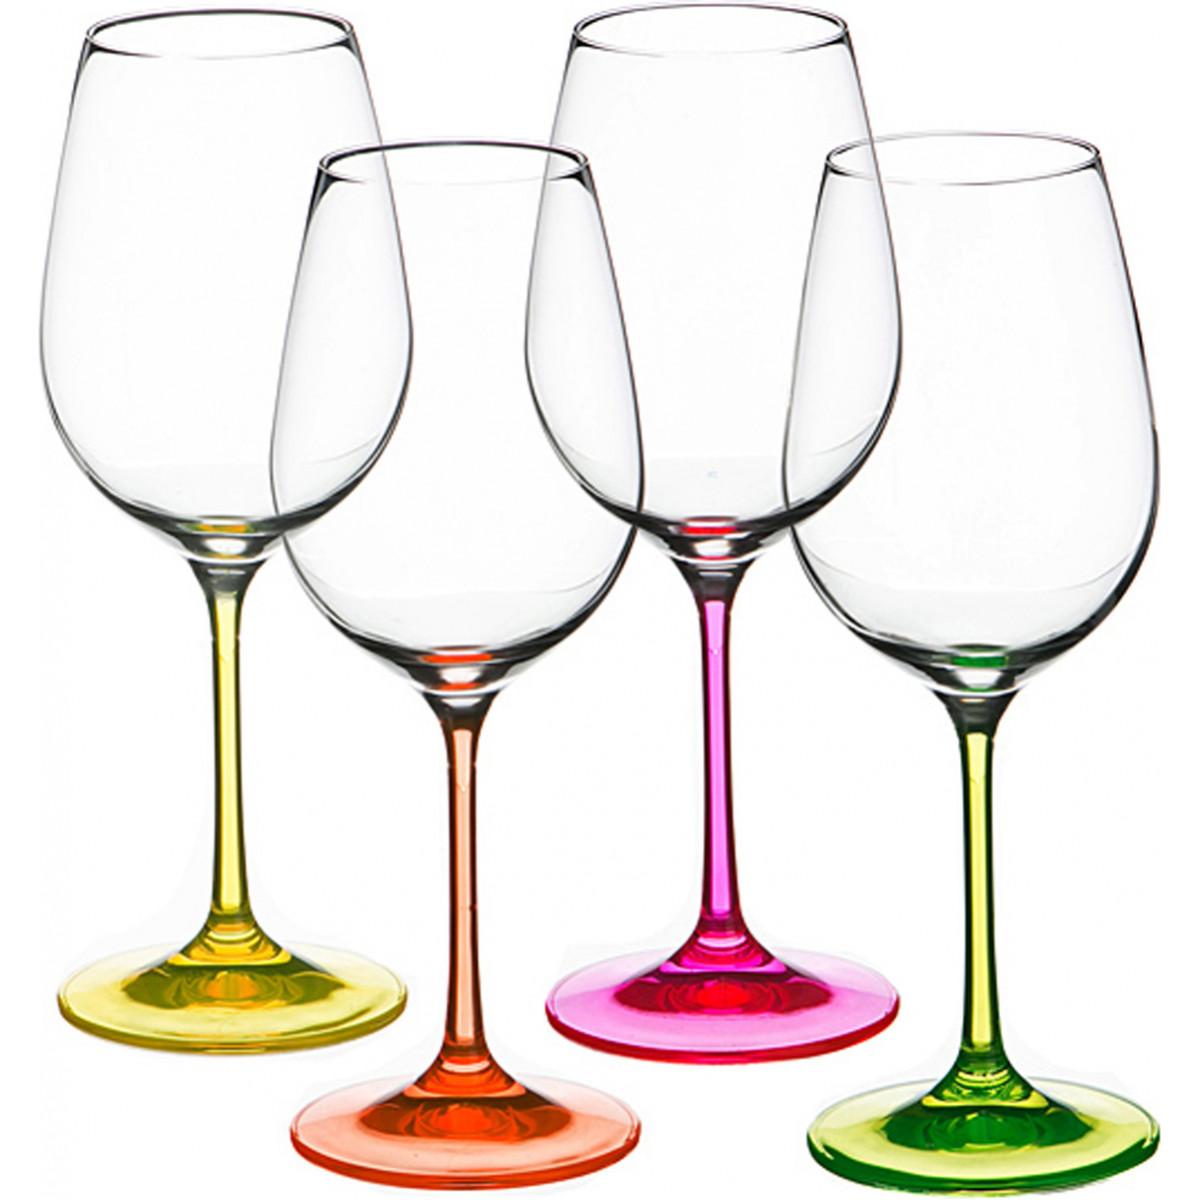 {} Bohemia Crystal Набор бокалов для вина Alma (22 см - 4 шт) bohemia crystal набор бокалов для шампанского felina 25 см 2 шт